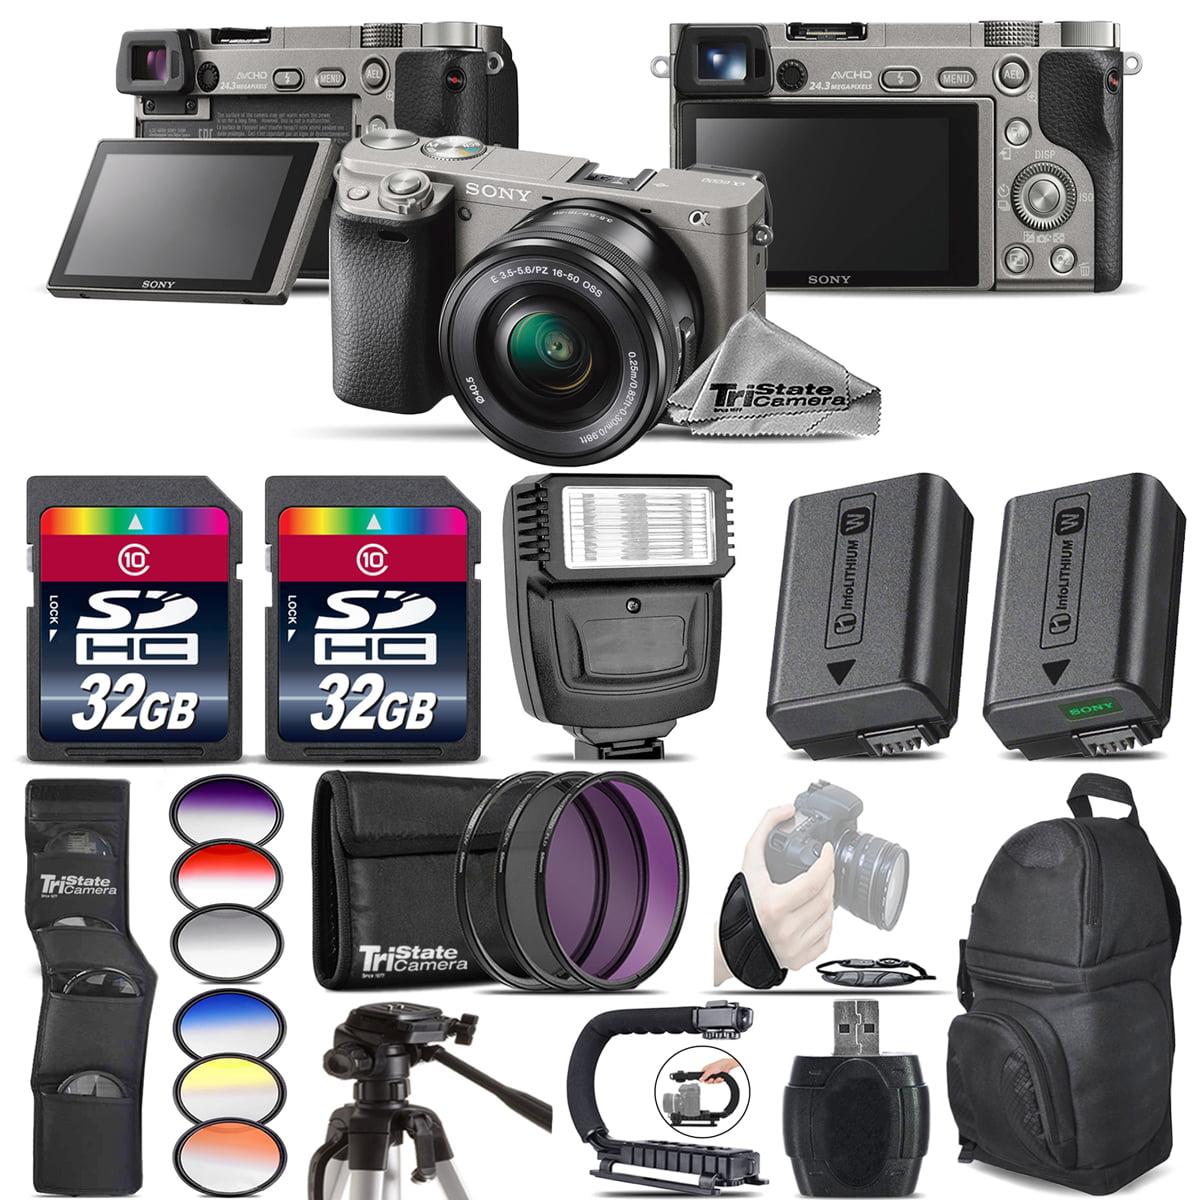 Sony Alpha a6000 Mirrorless Camera + Flash + Extra Battery + UV-CPL-FLD + 64GB